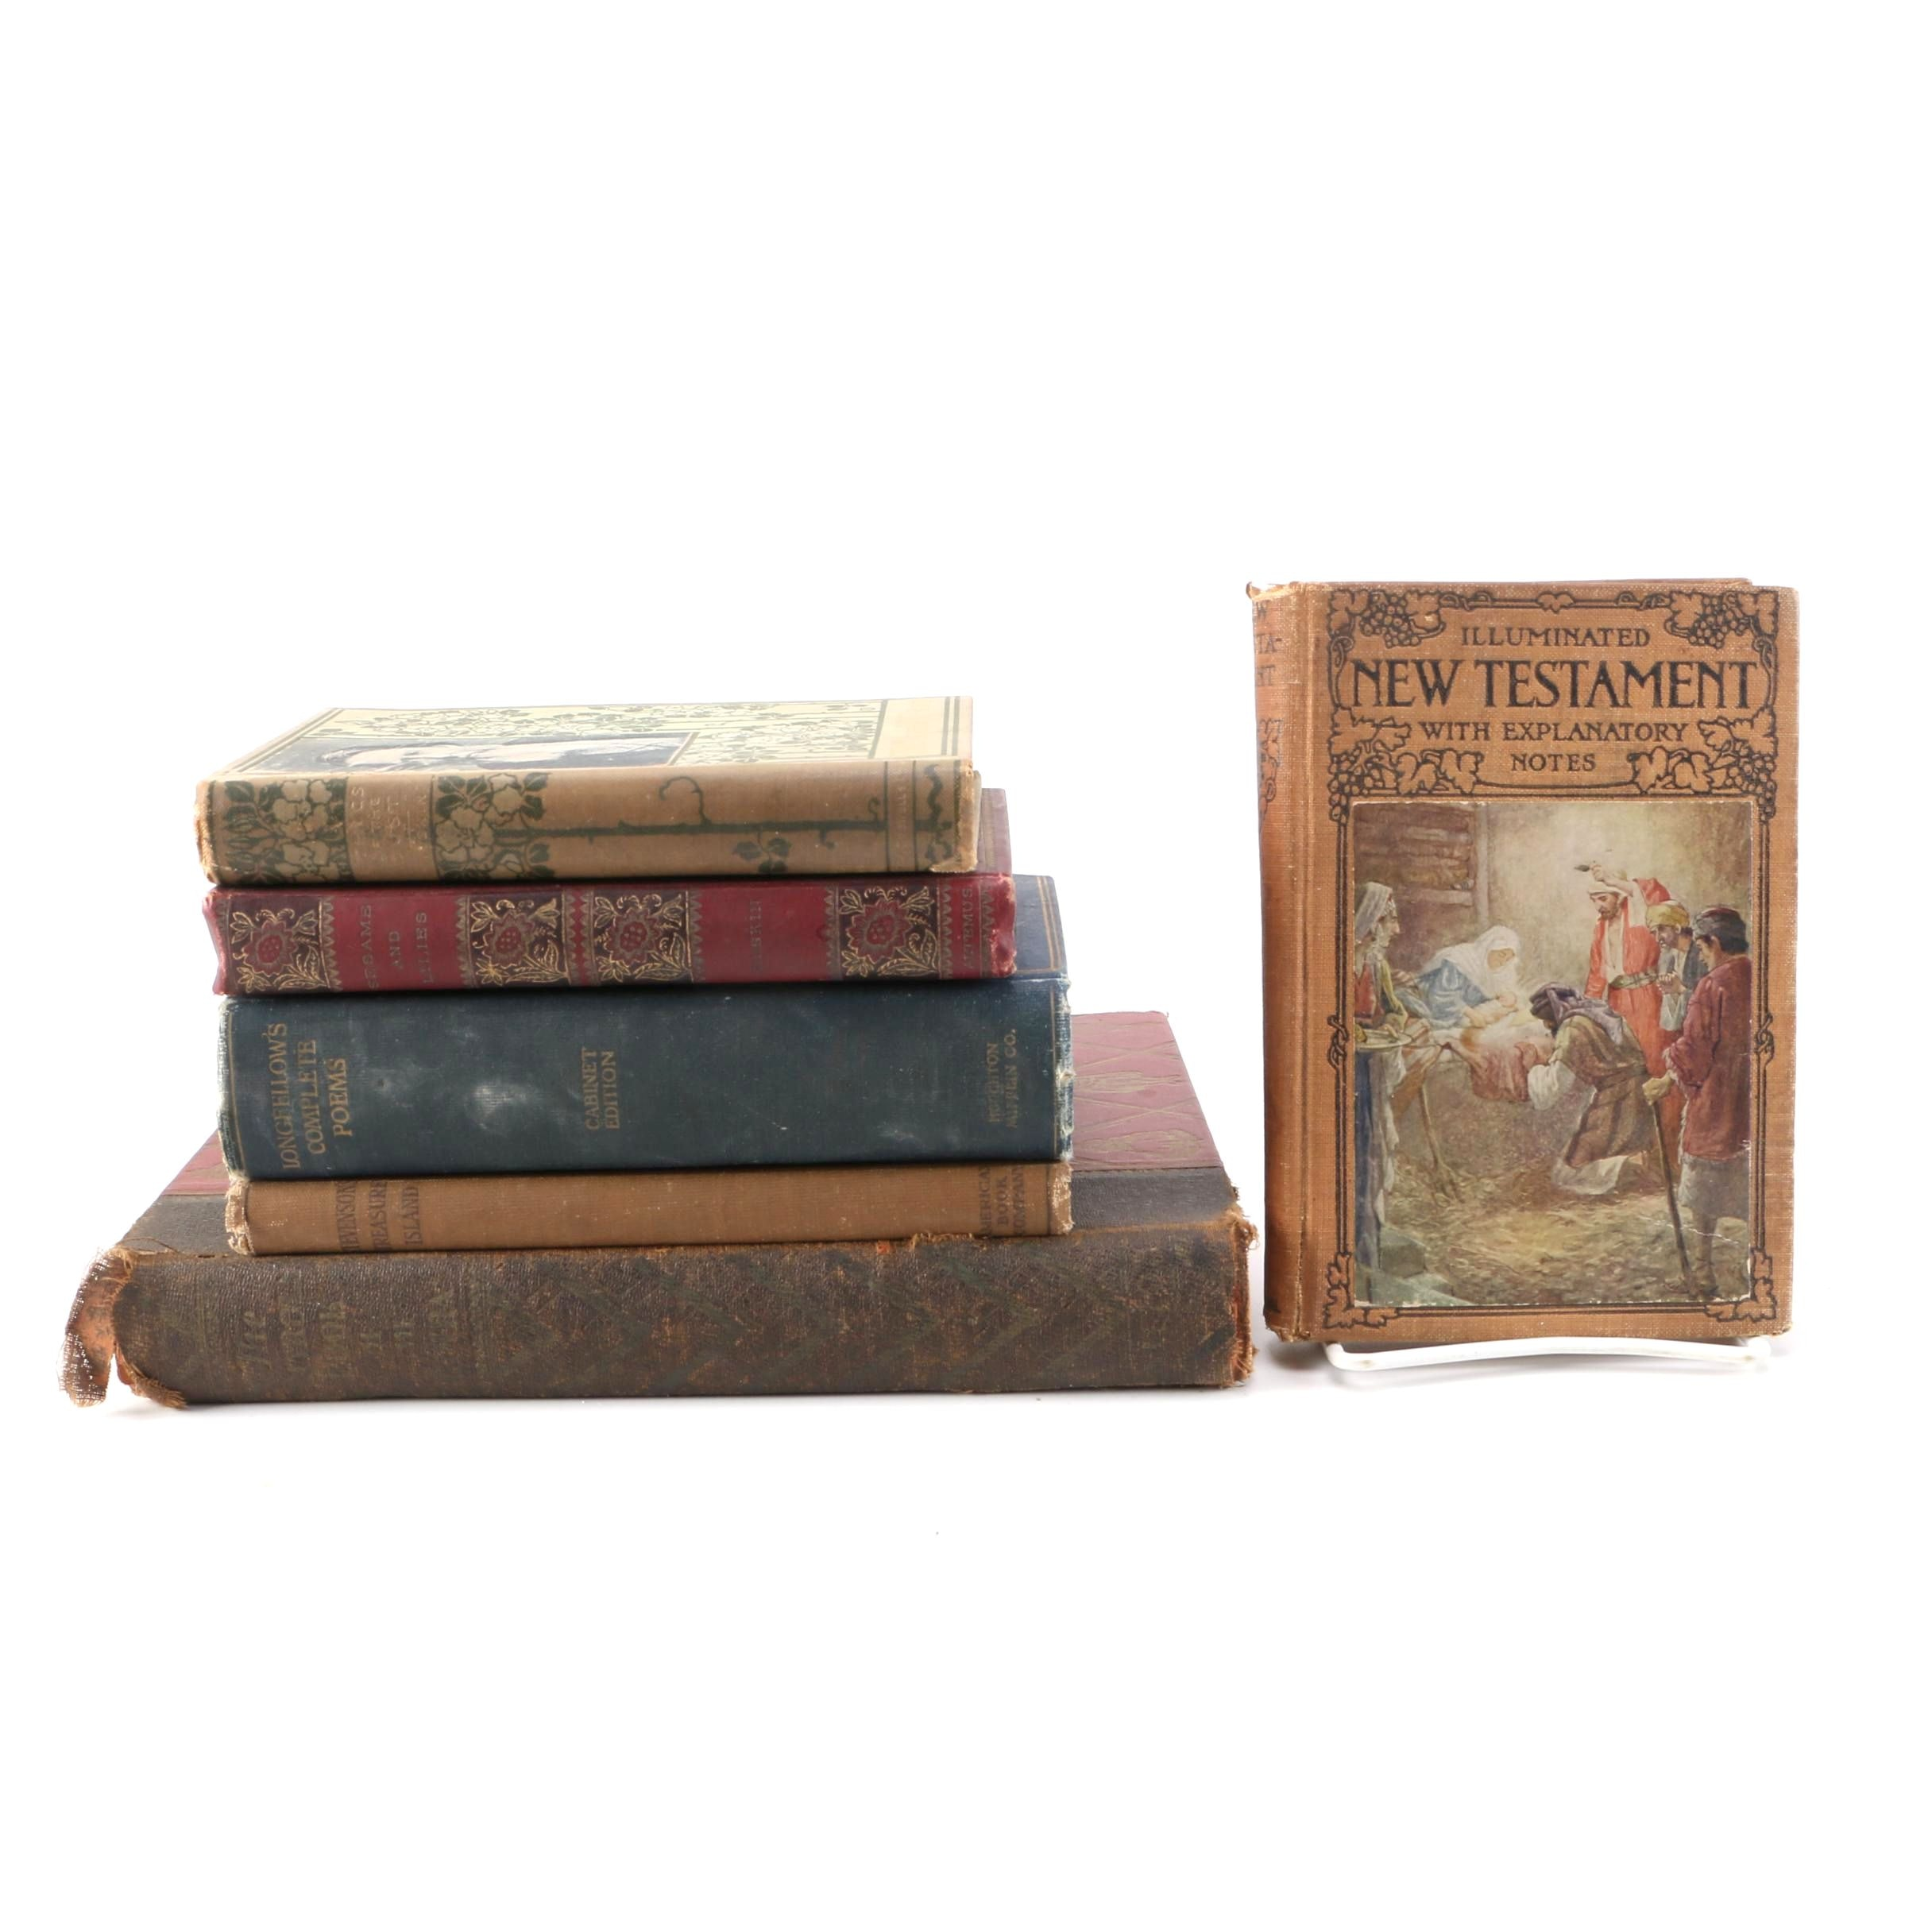 Assorted Books Featuring John Ruskin